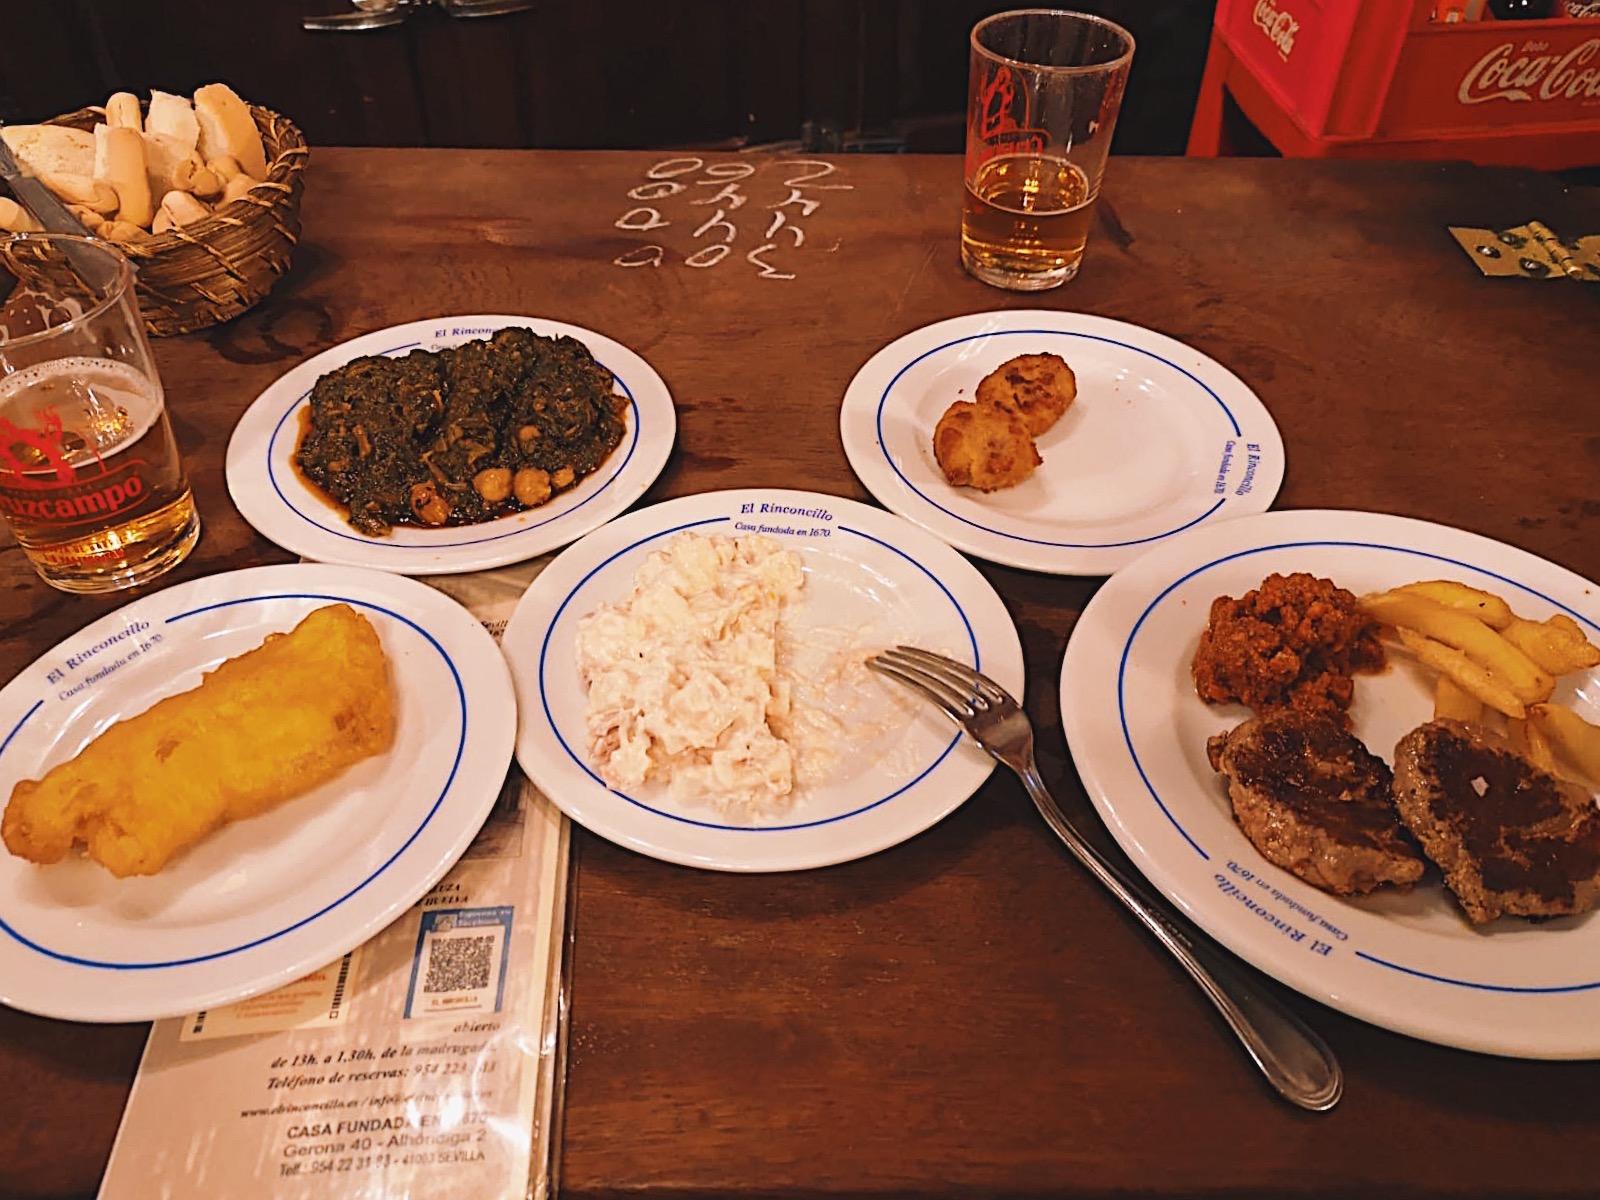 redhead-round-the-world-blogger-food-foodie-foodblog-spain-el-rinconcillo-food-beer-fish-menu.JPG